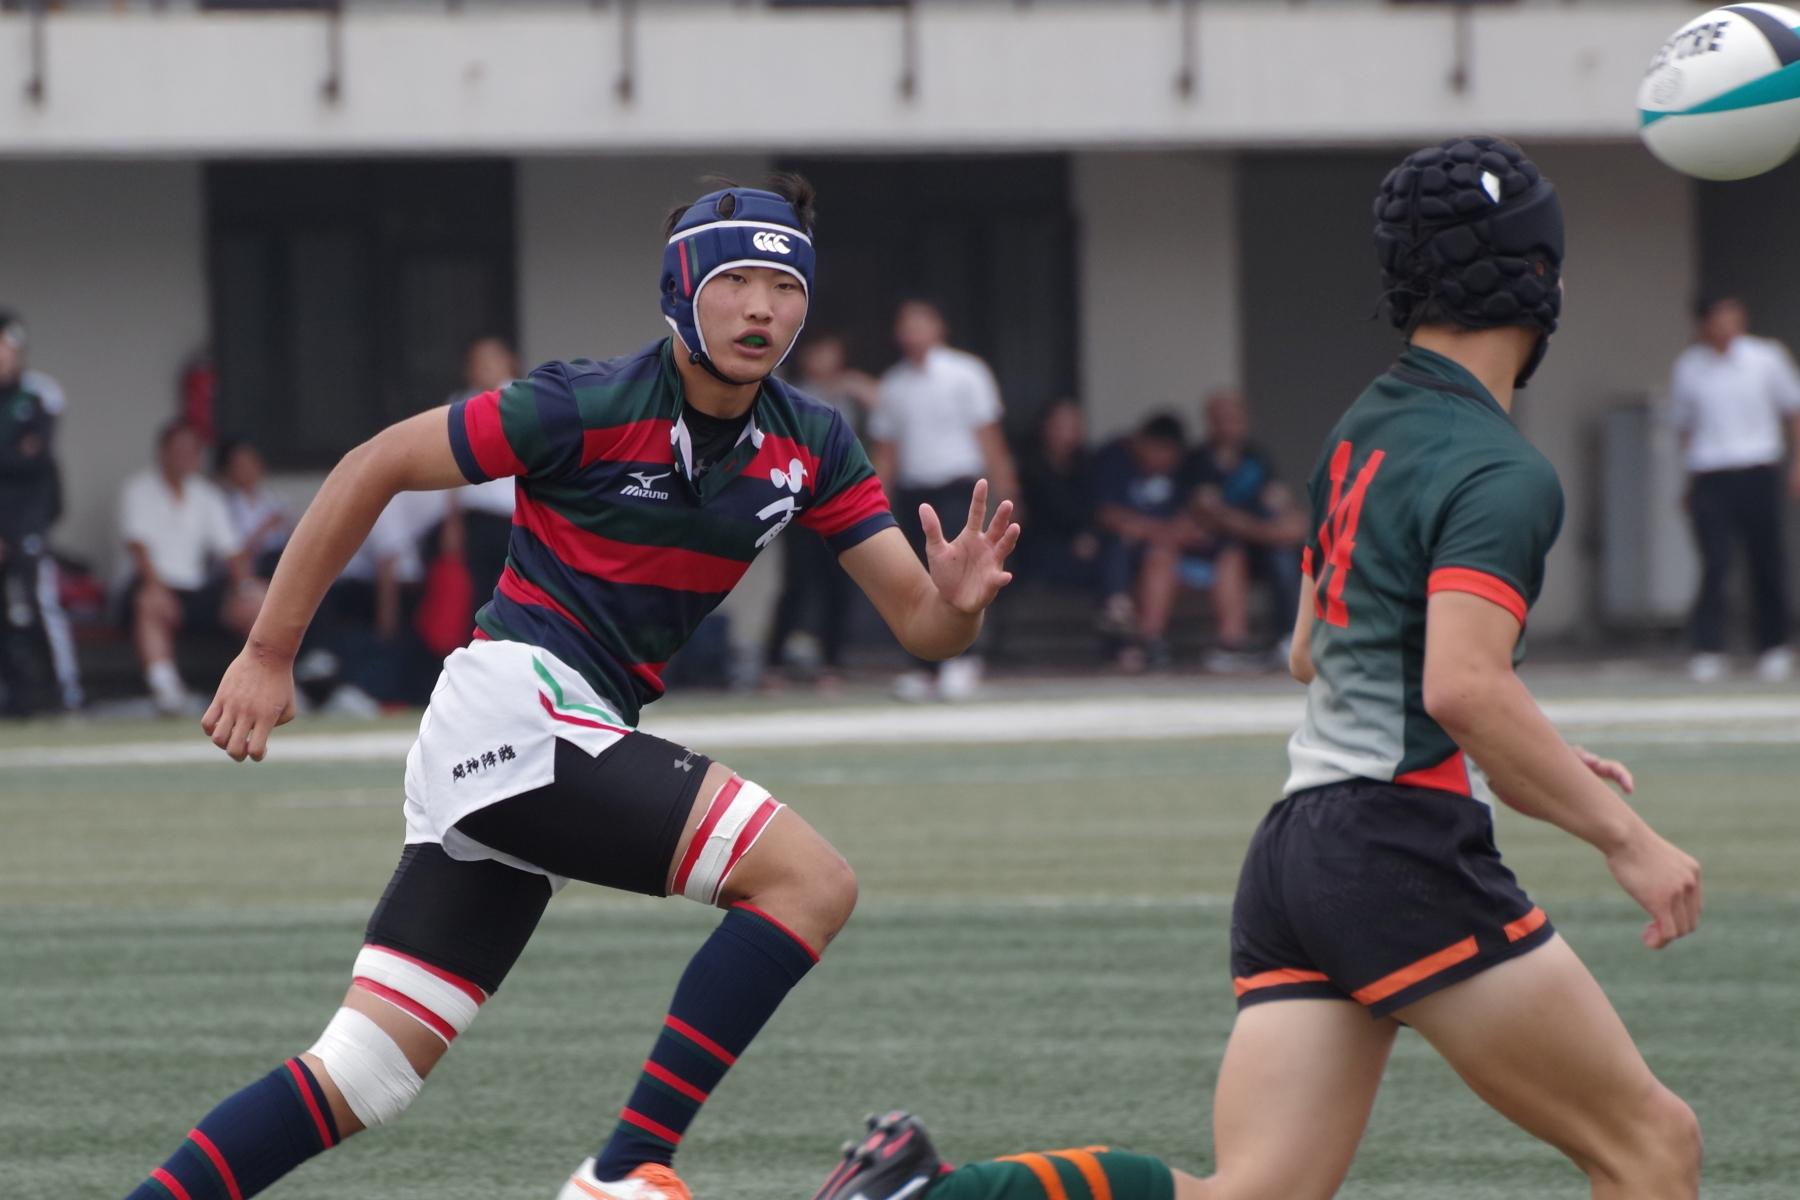 http://kokura-rugby.sakura.ne.jp/180610_112108_0579.jpg